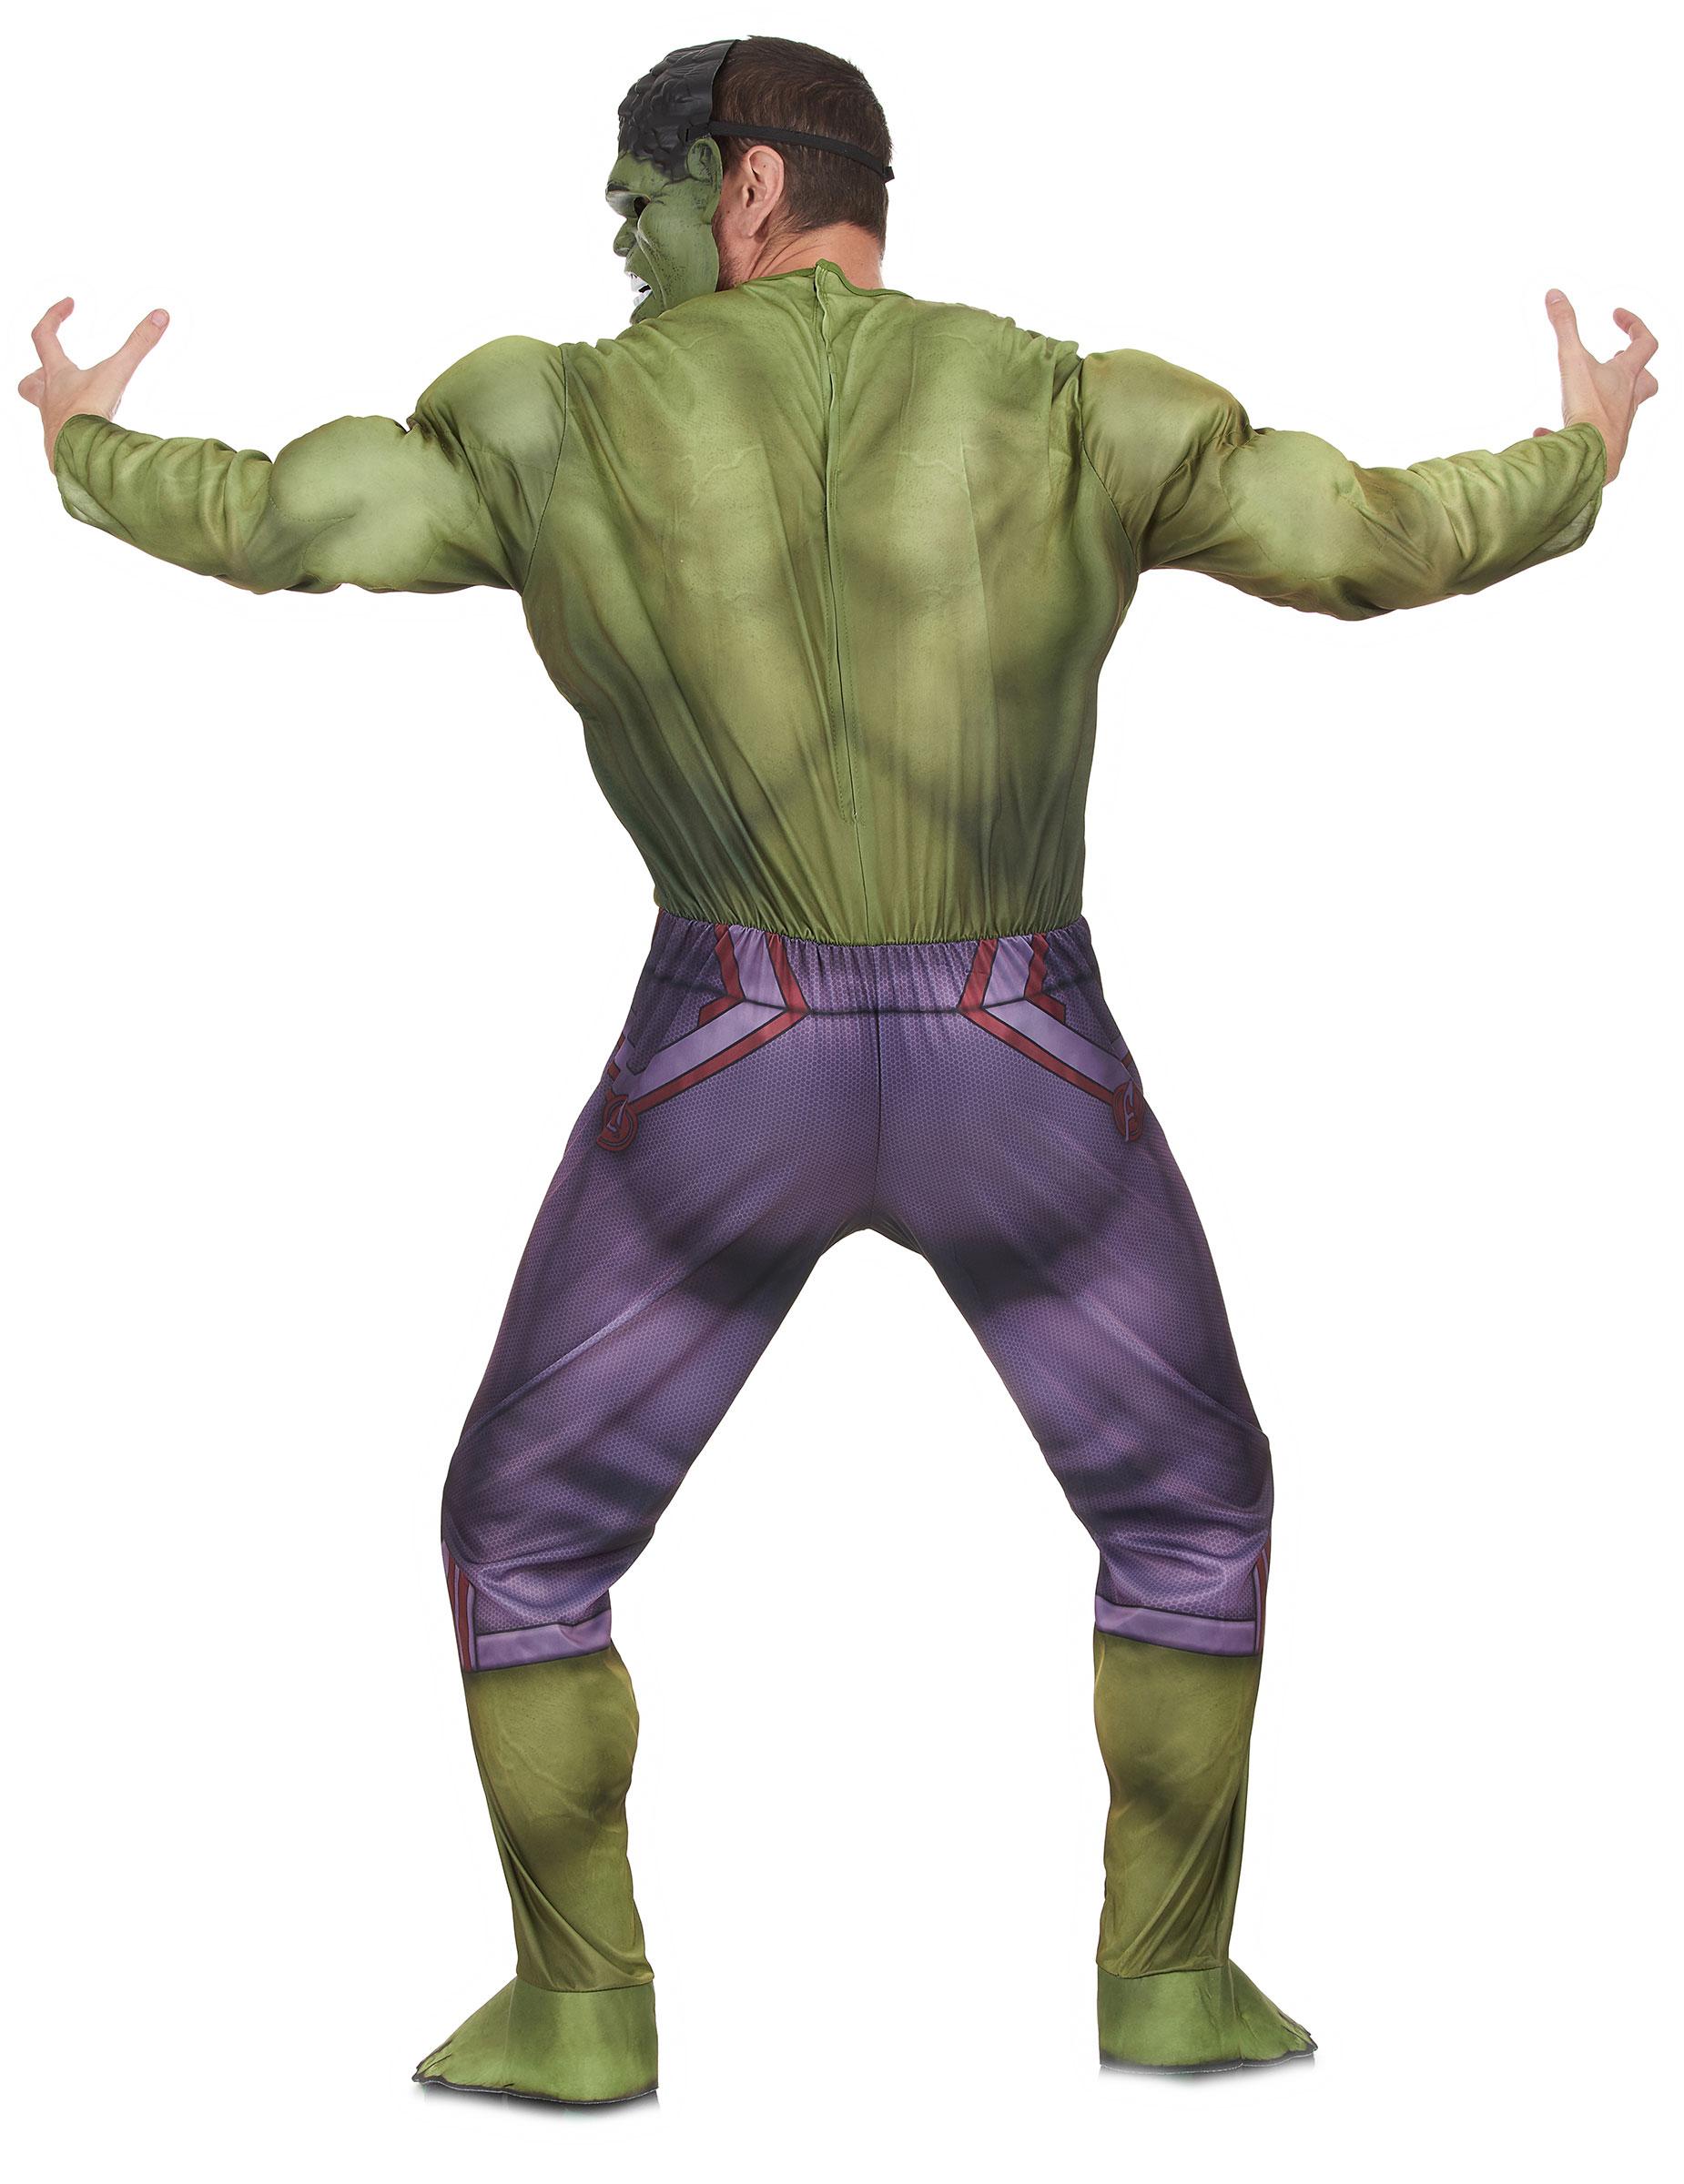 Verkleidung Hulk Film 2 Kostme Fr Erwachseneund